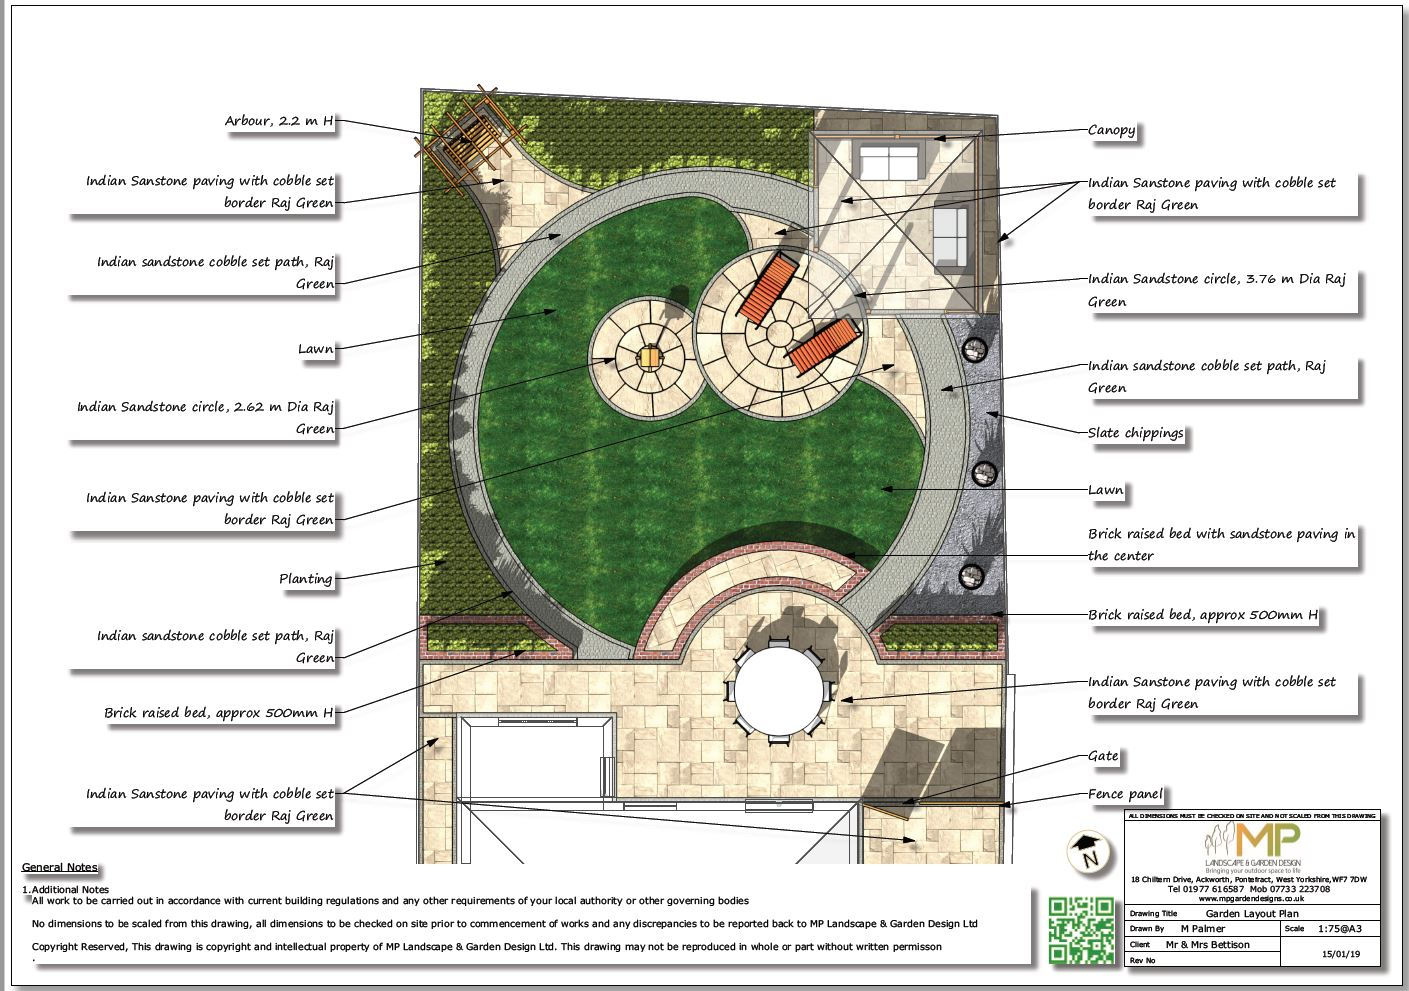 Garden layout plans for a rear garden in Wakefield.